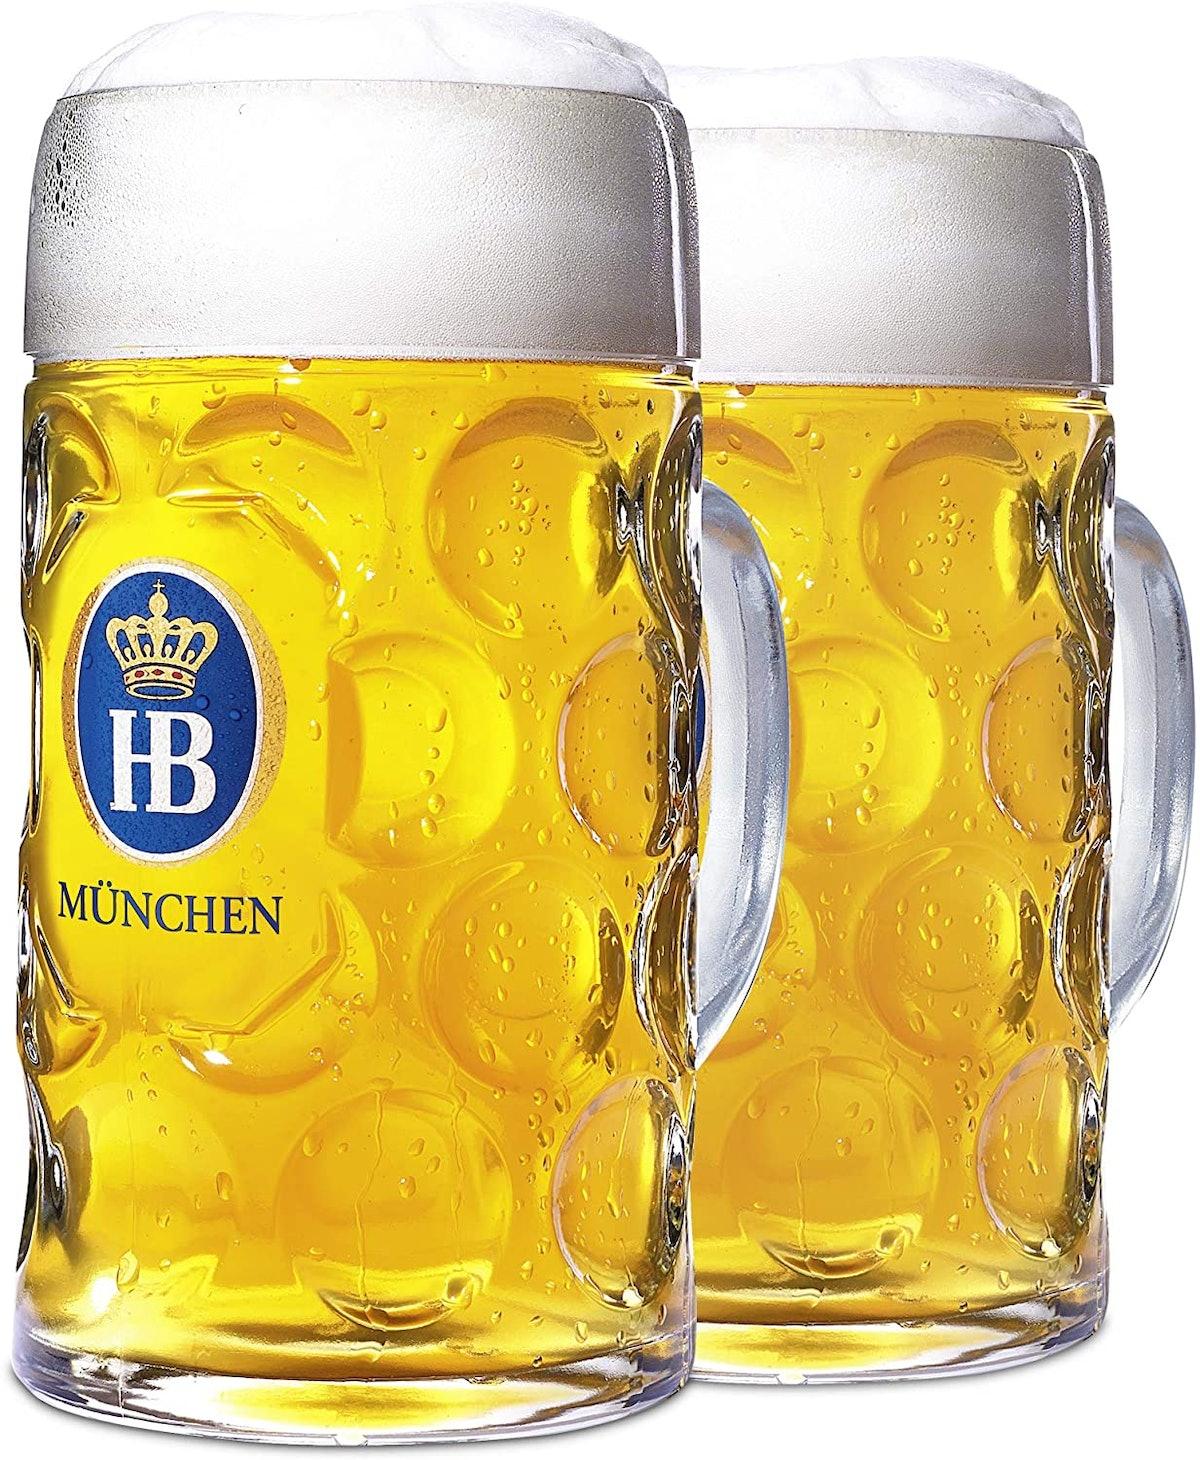 "1 Liter HB ""Hofbrauhaus Munchen"" Dimpled Glass Beer Stein (Pack of 2)"